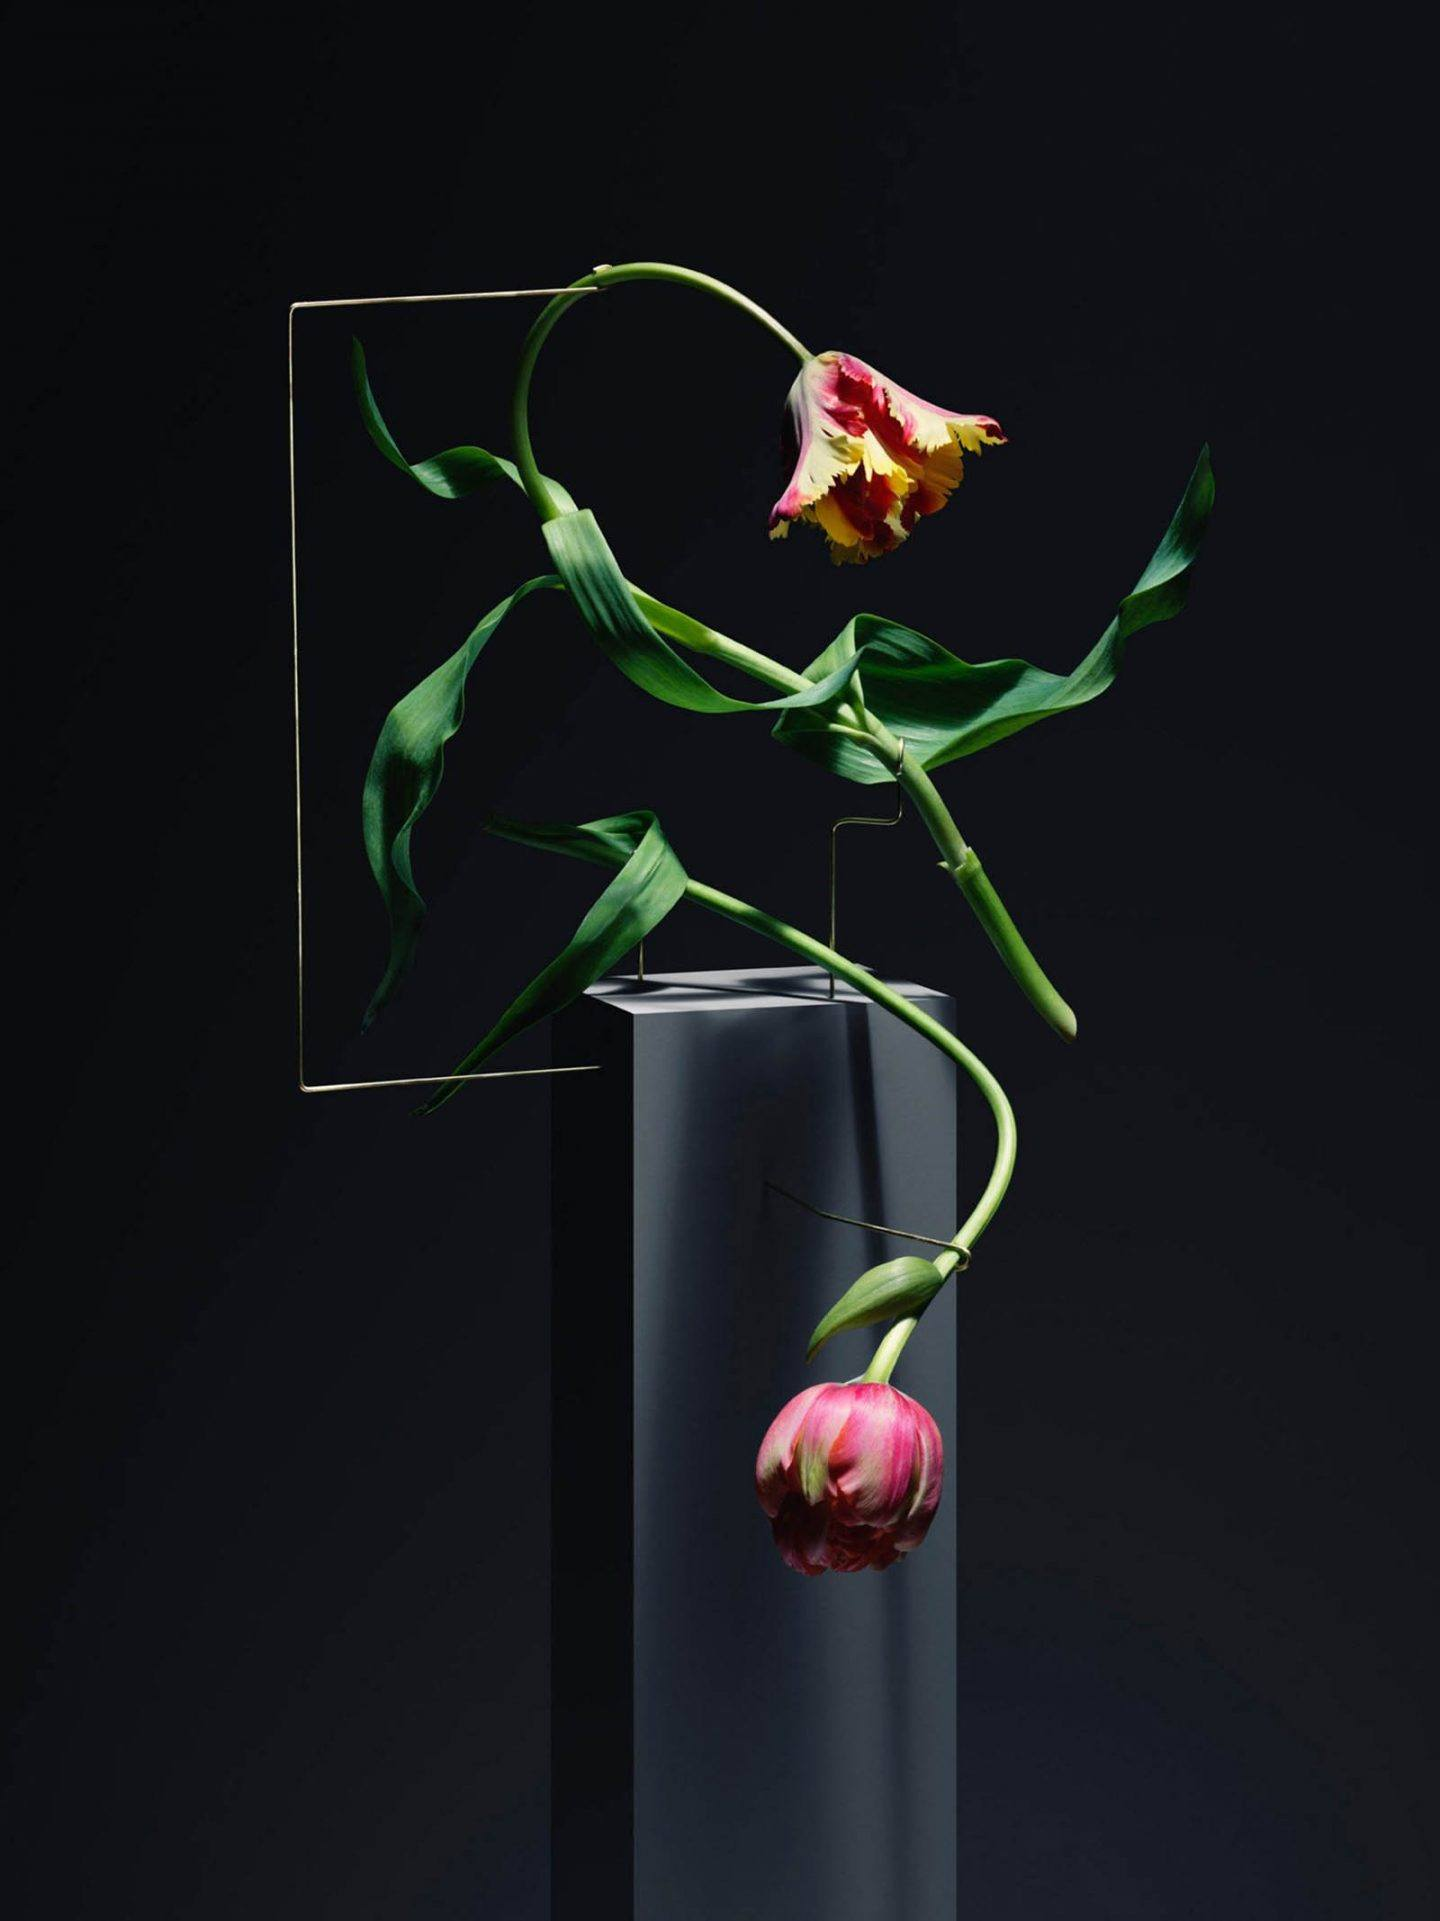 iGNANT-Art-Carl-Kleiner-Postures-004